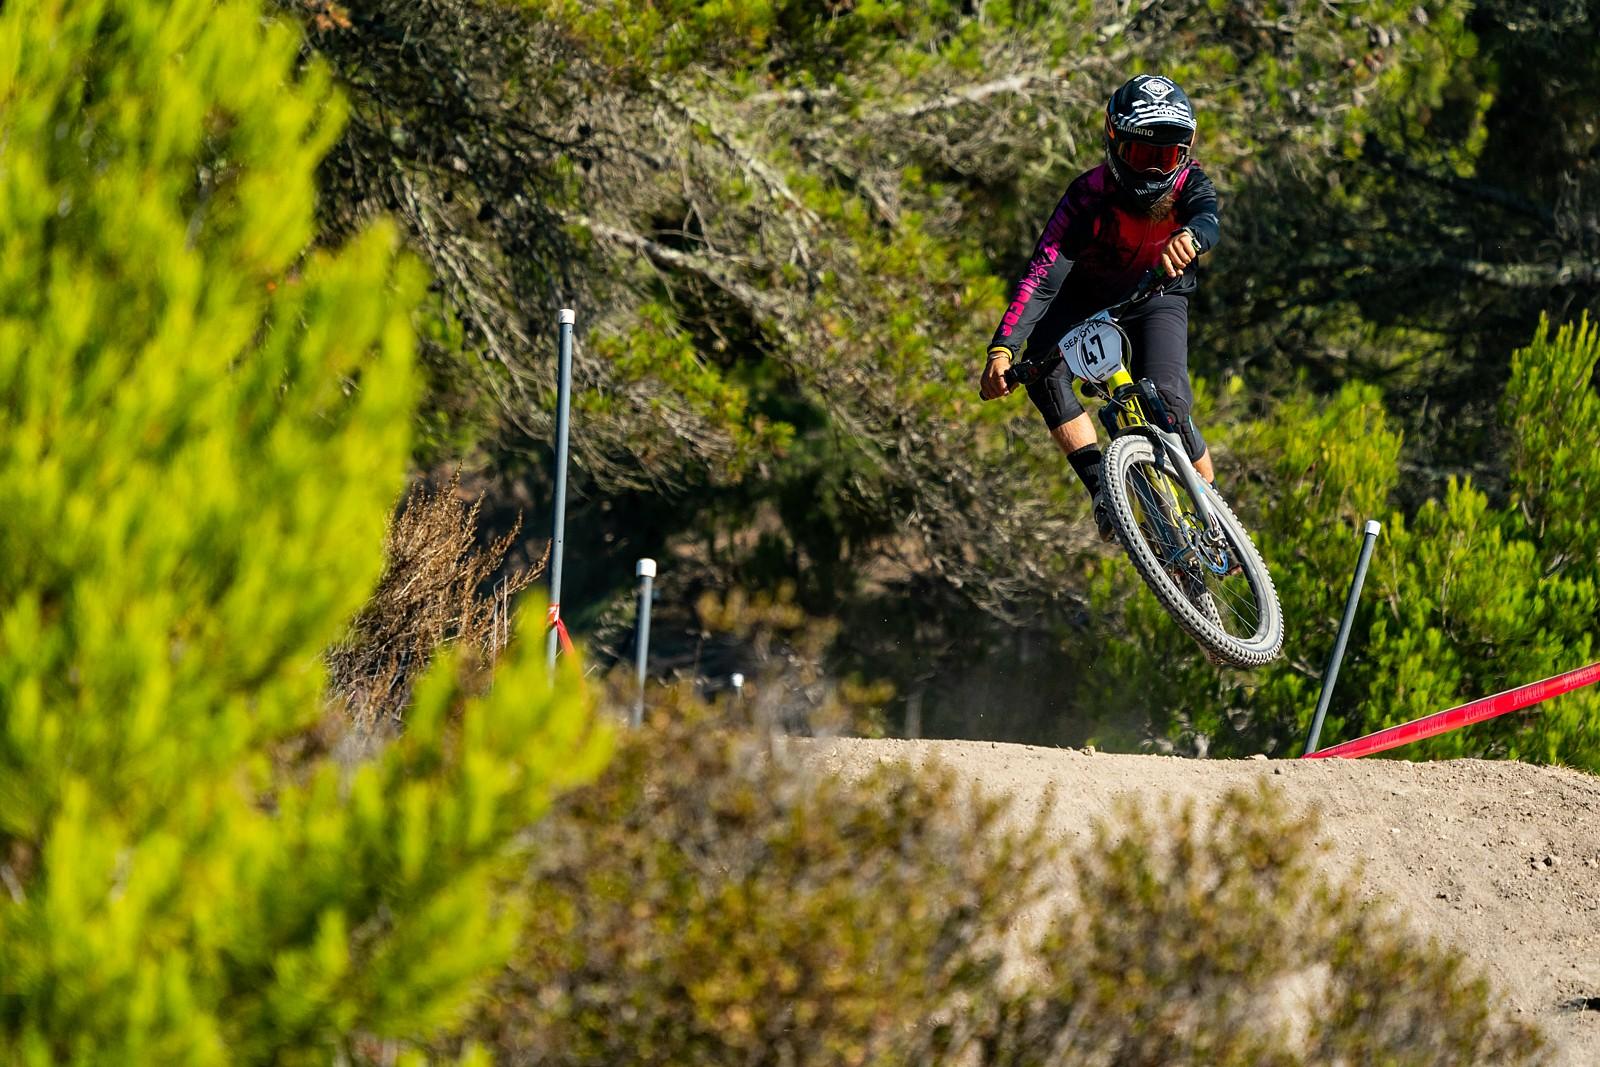 Mikey Haderer - Zuestman - Mountain Biking Pictures - Vital MTB